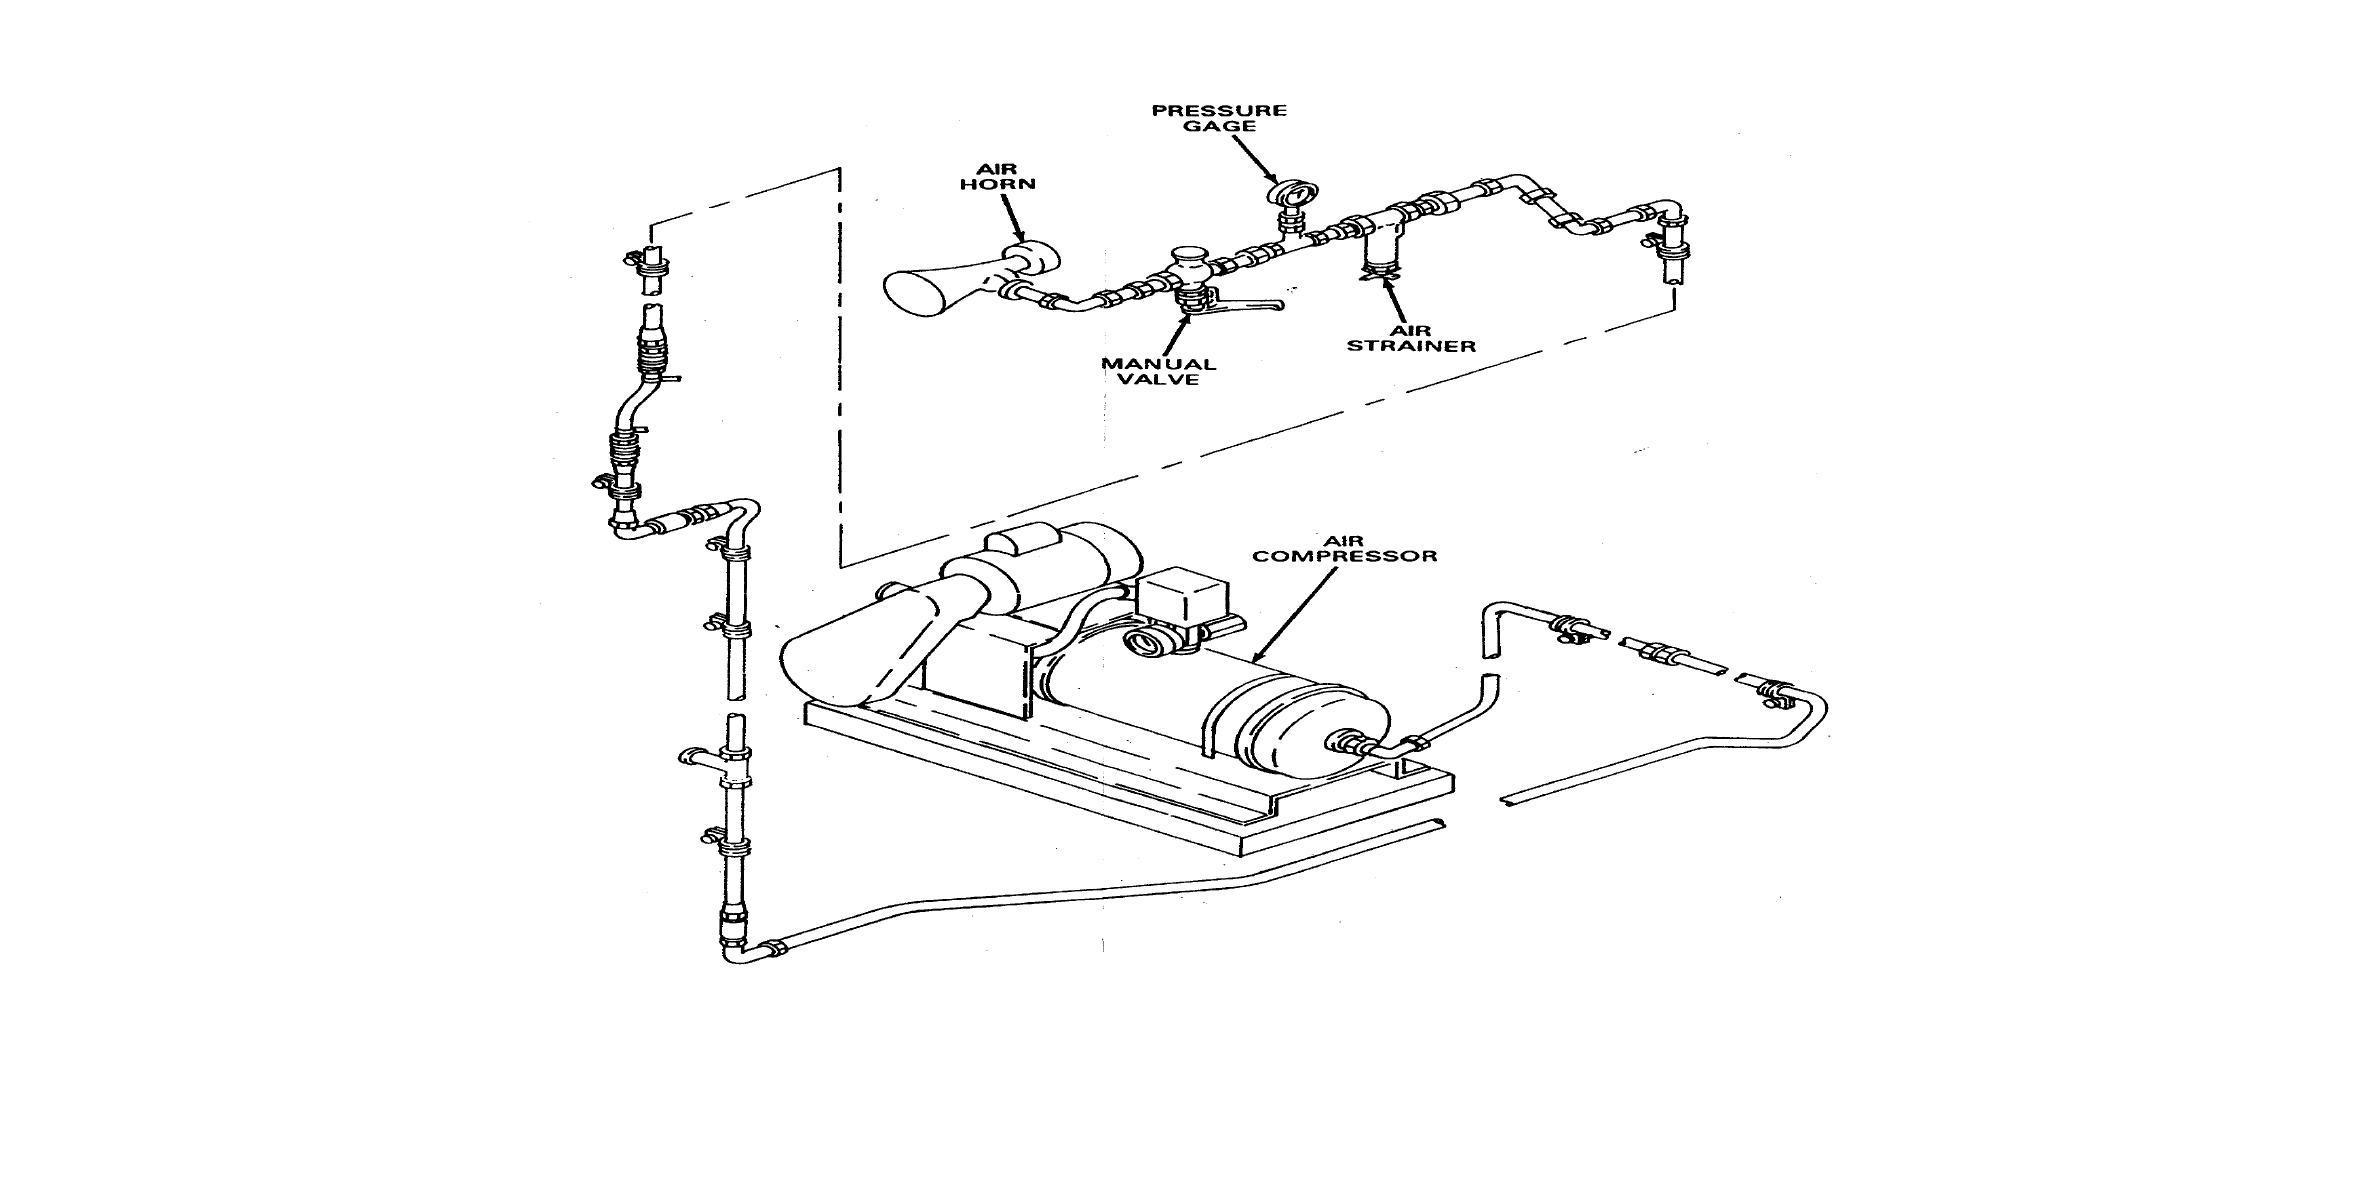 Fo 7 Air Horn Air Compressor System